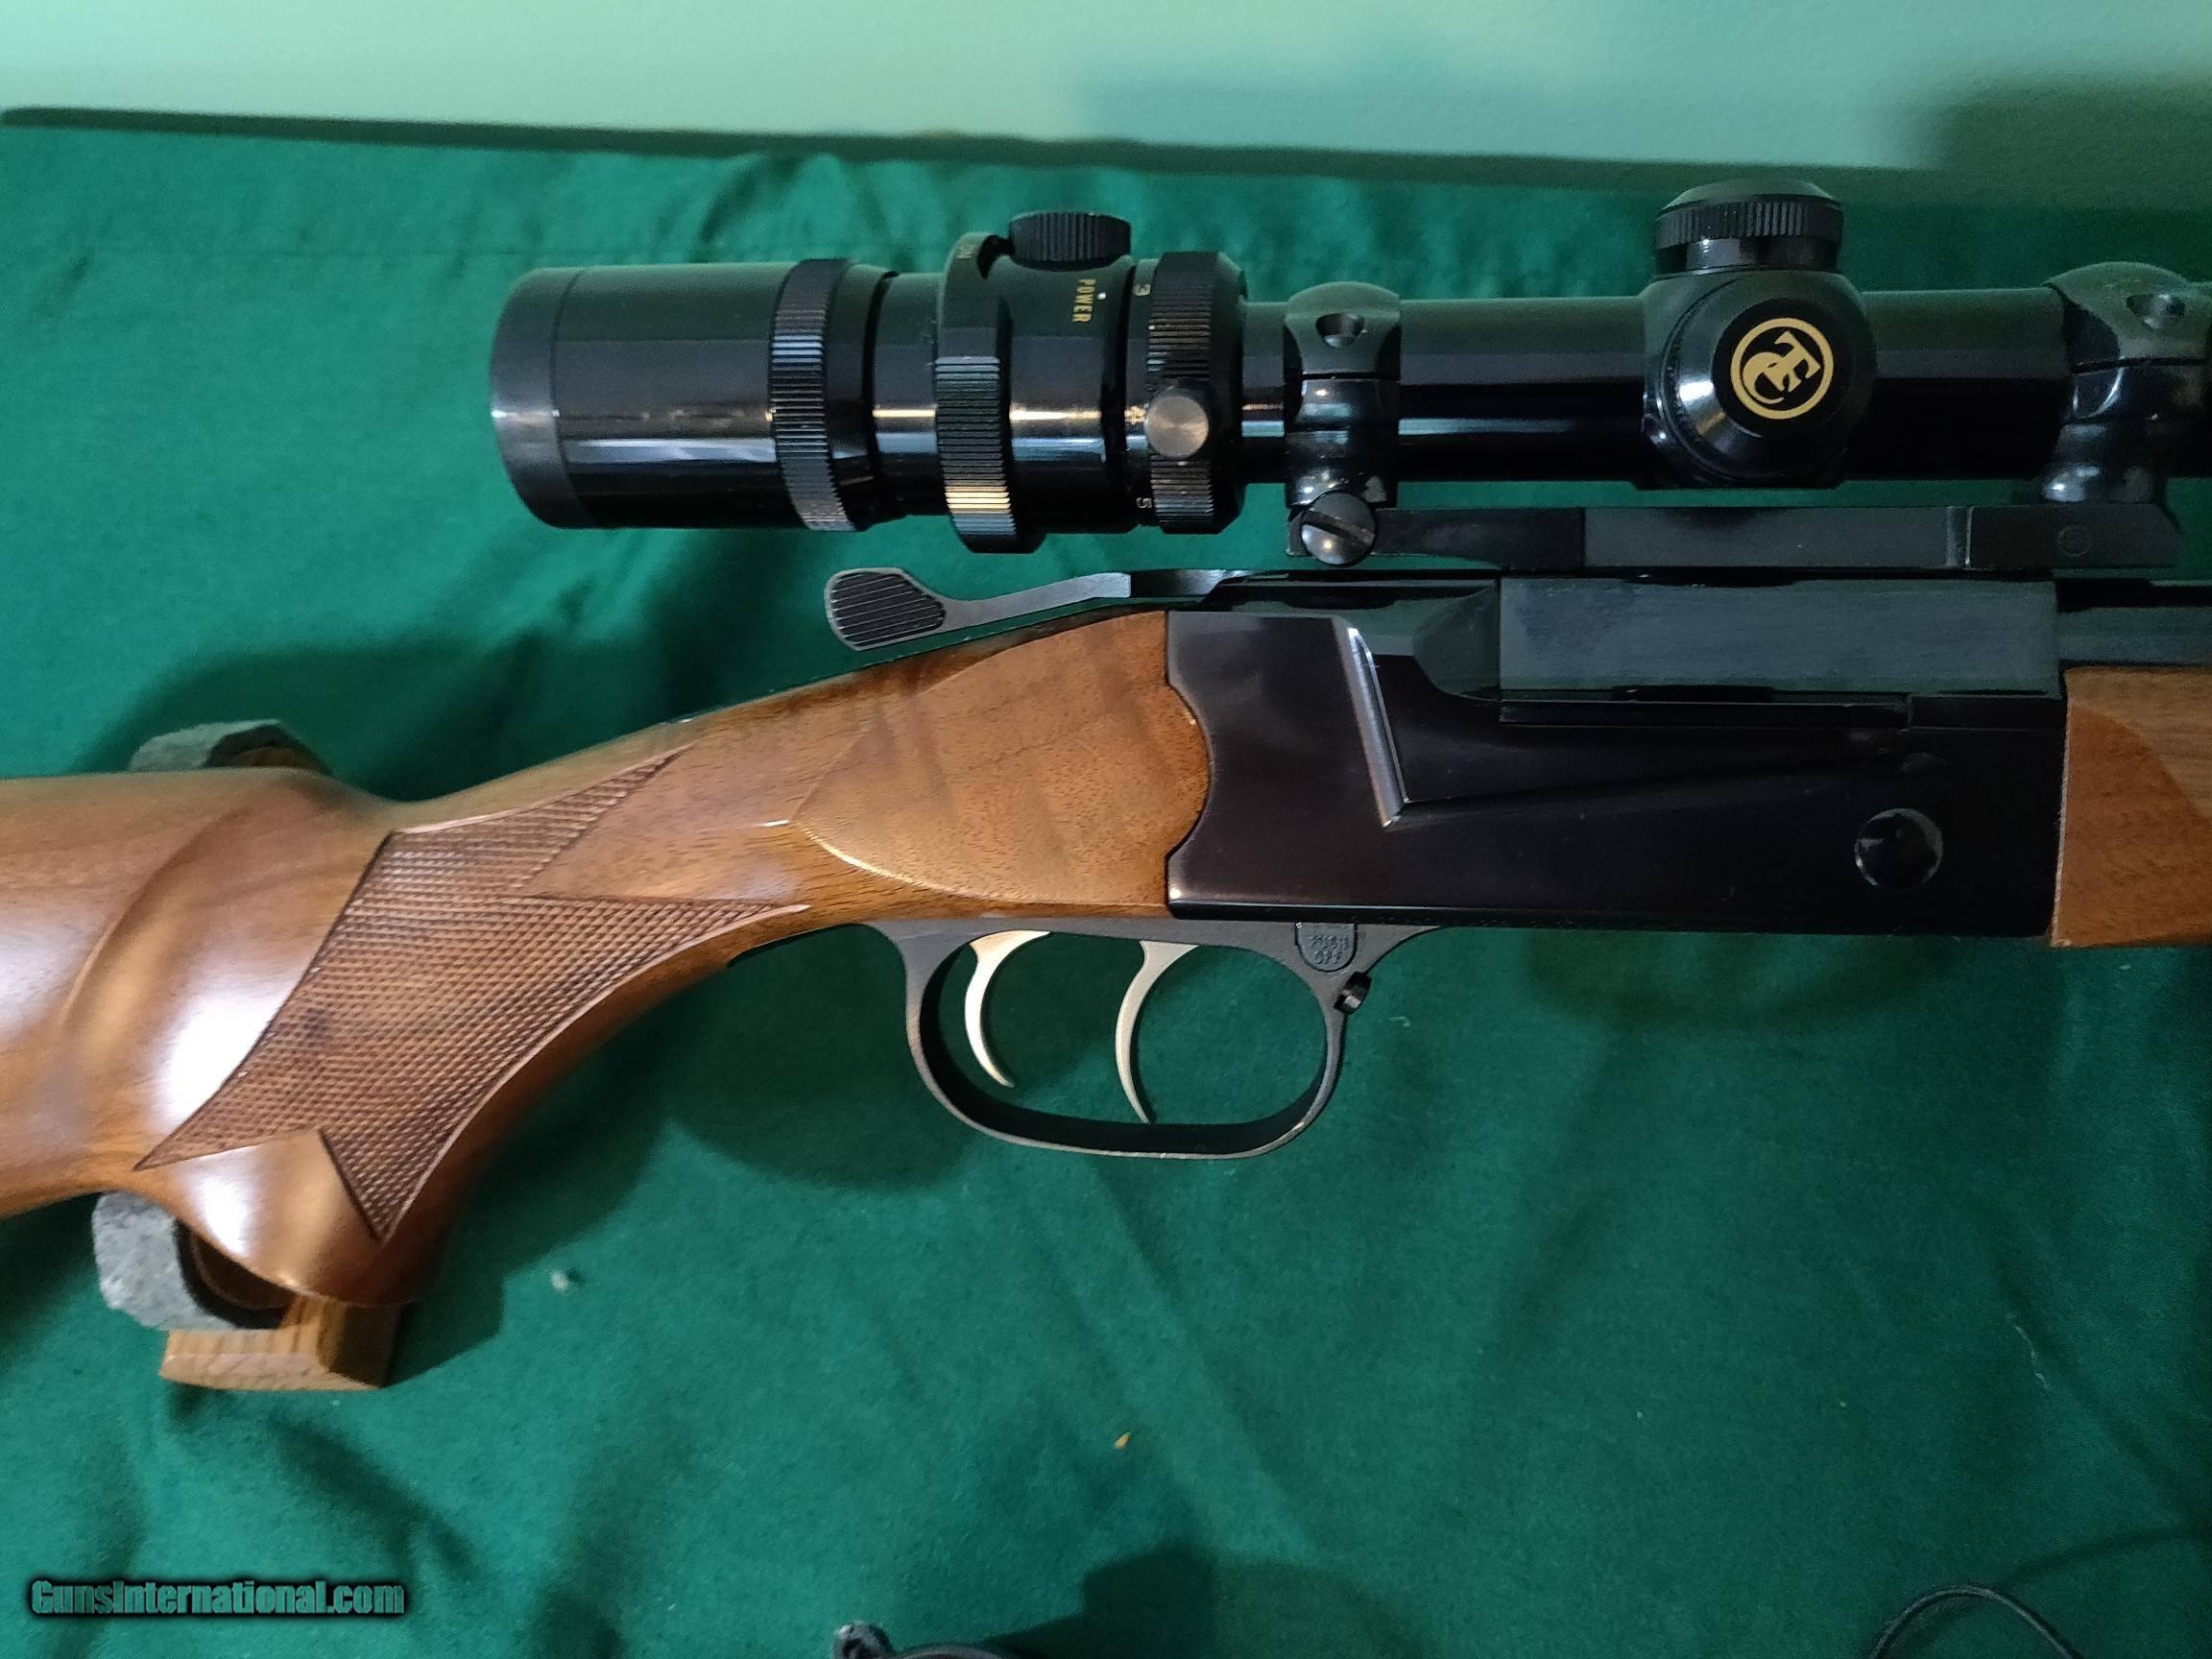 Thompson Center TCR 83 Aristocrat rifle and TC scope, 22/250